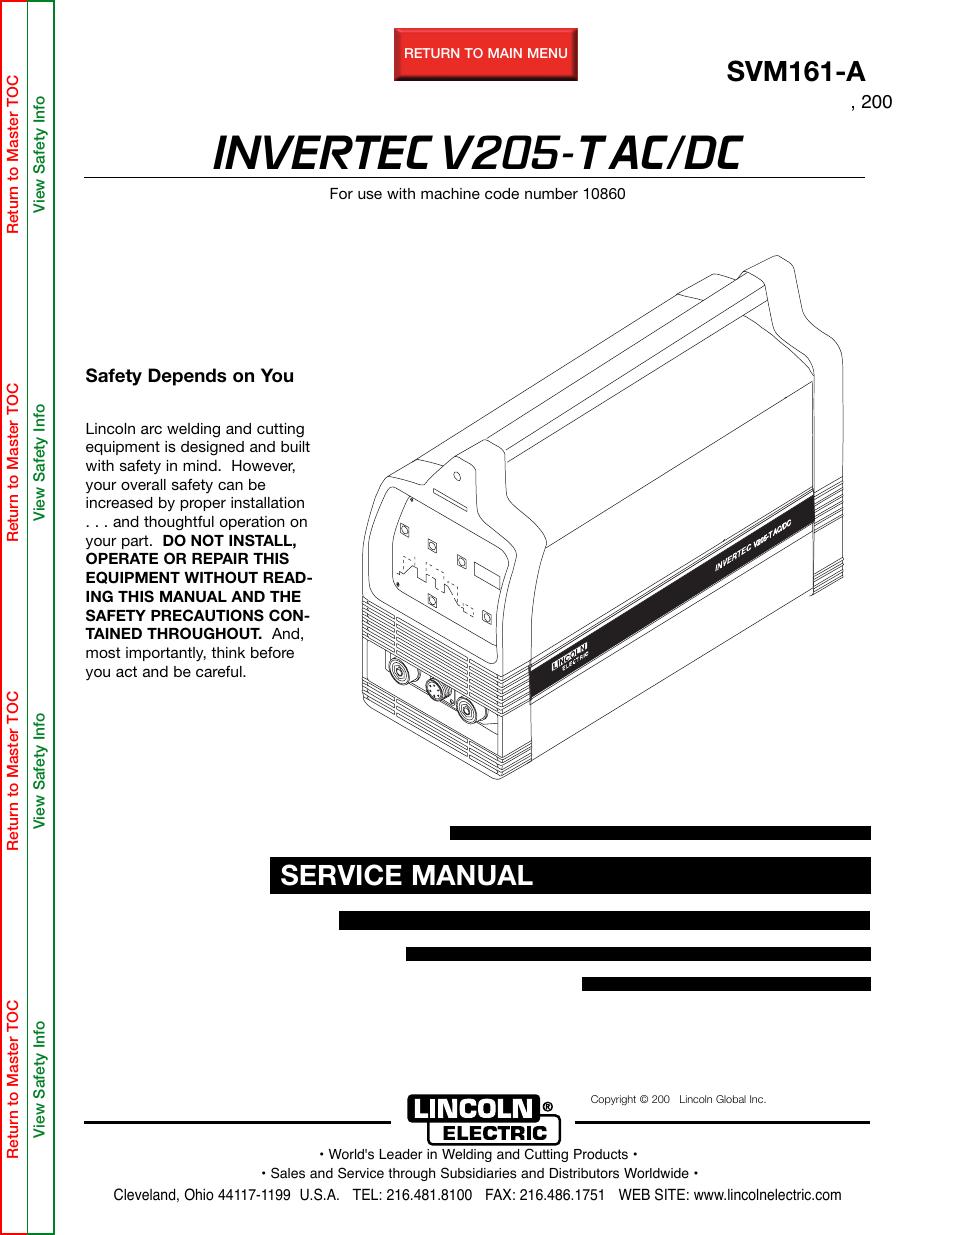 lincoln electric invertec v205 t user manual 109 pages rh manualsdir com Brian Johnson Bon Scott